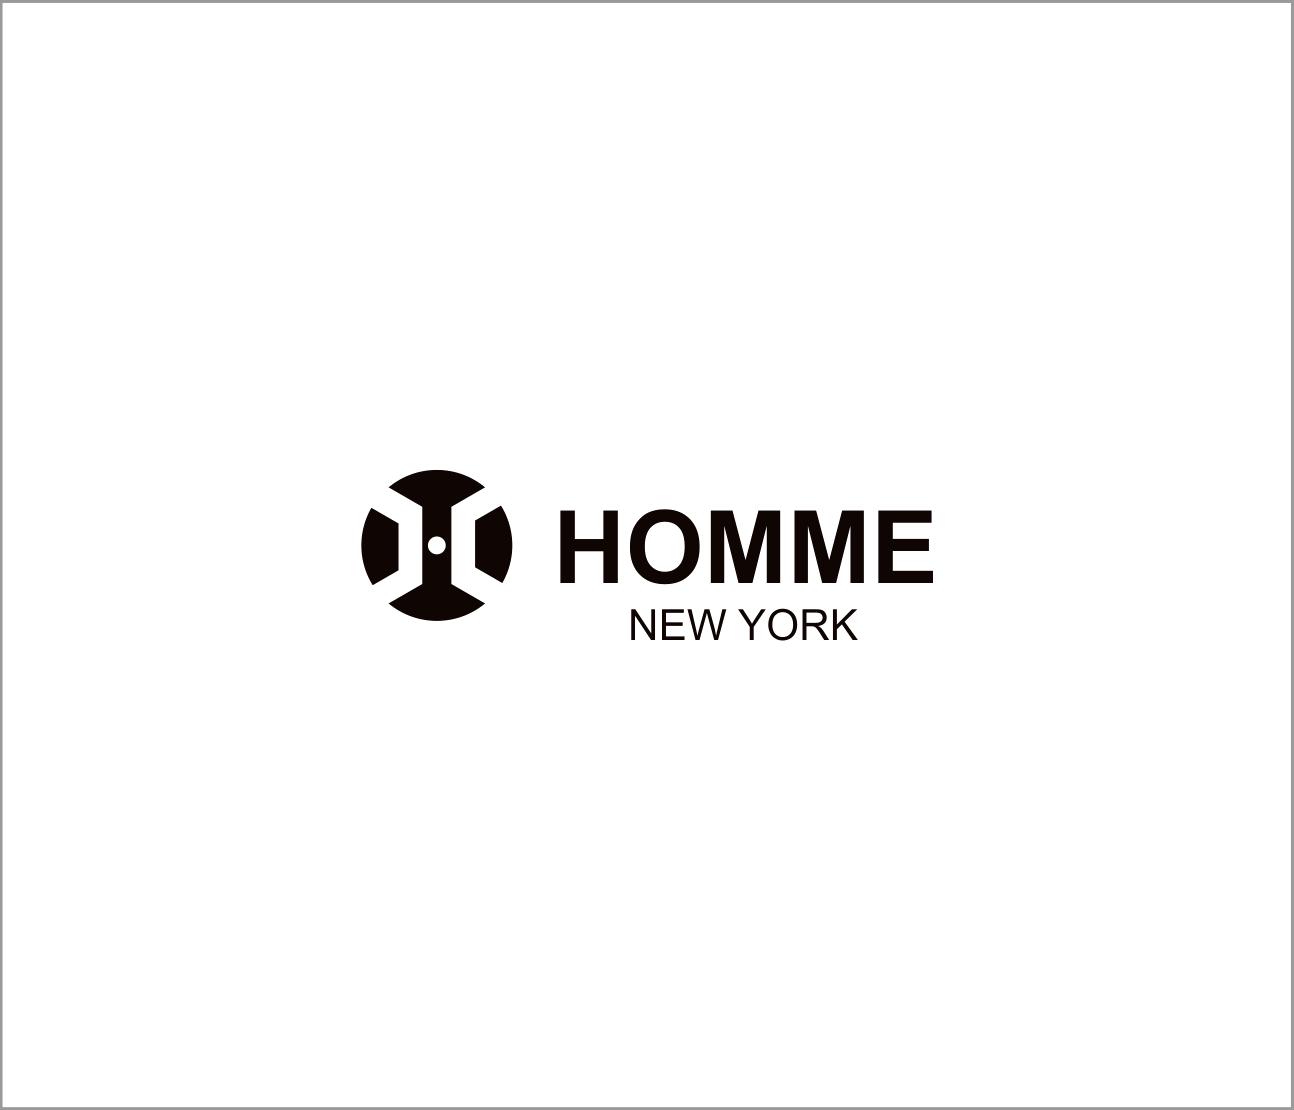 Logo Design by Armada Jamaluddin - Entry No. 52 in the Logo Design Contest Artistic Logo Design for HOMME | NEW YORK.